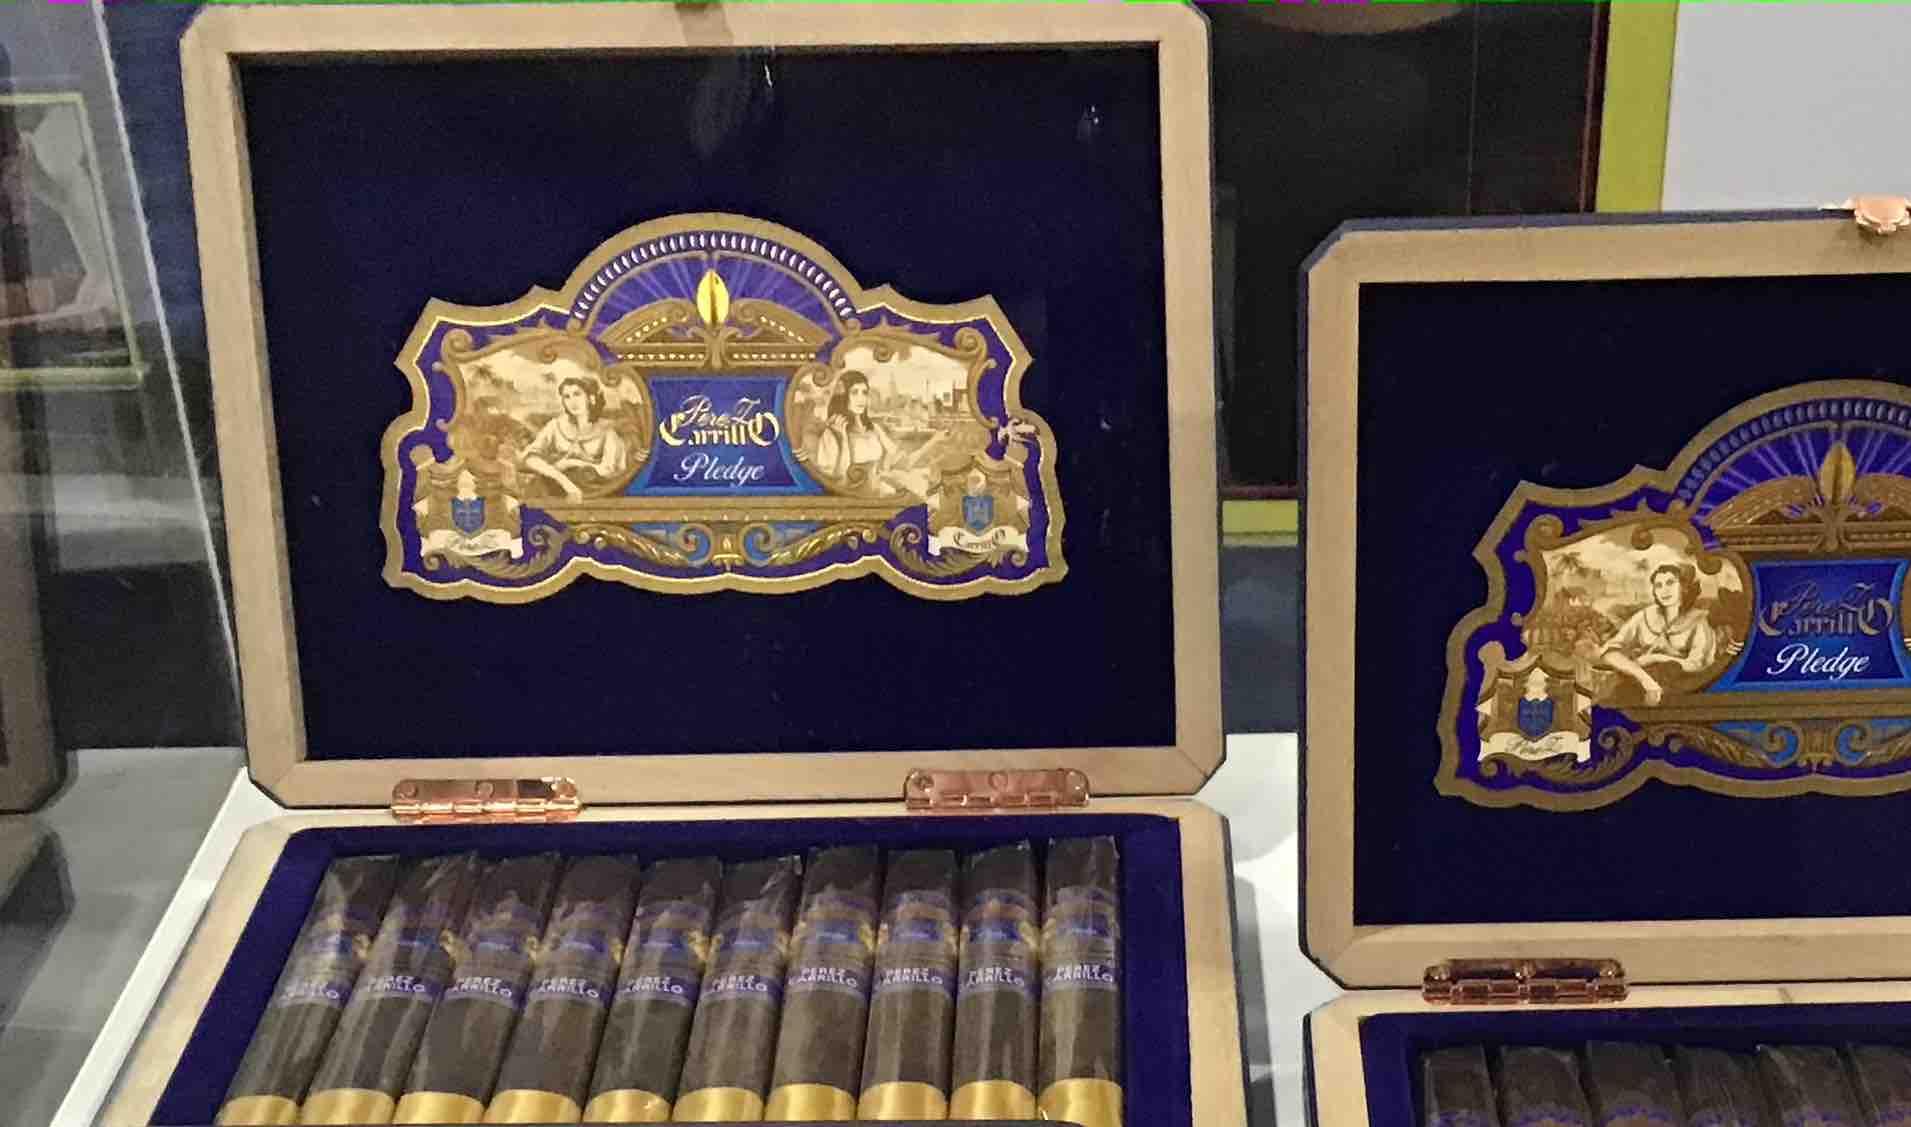 Cigar News: E.P. Carrillo Pledge Apogee Makes Debut at 2021 PCA